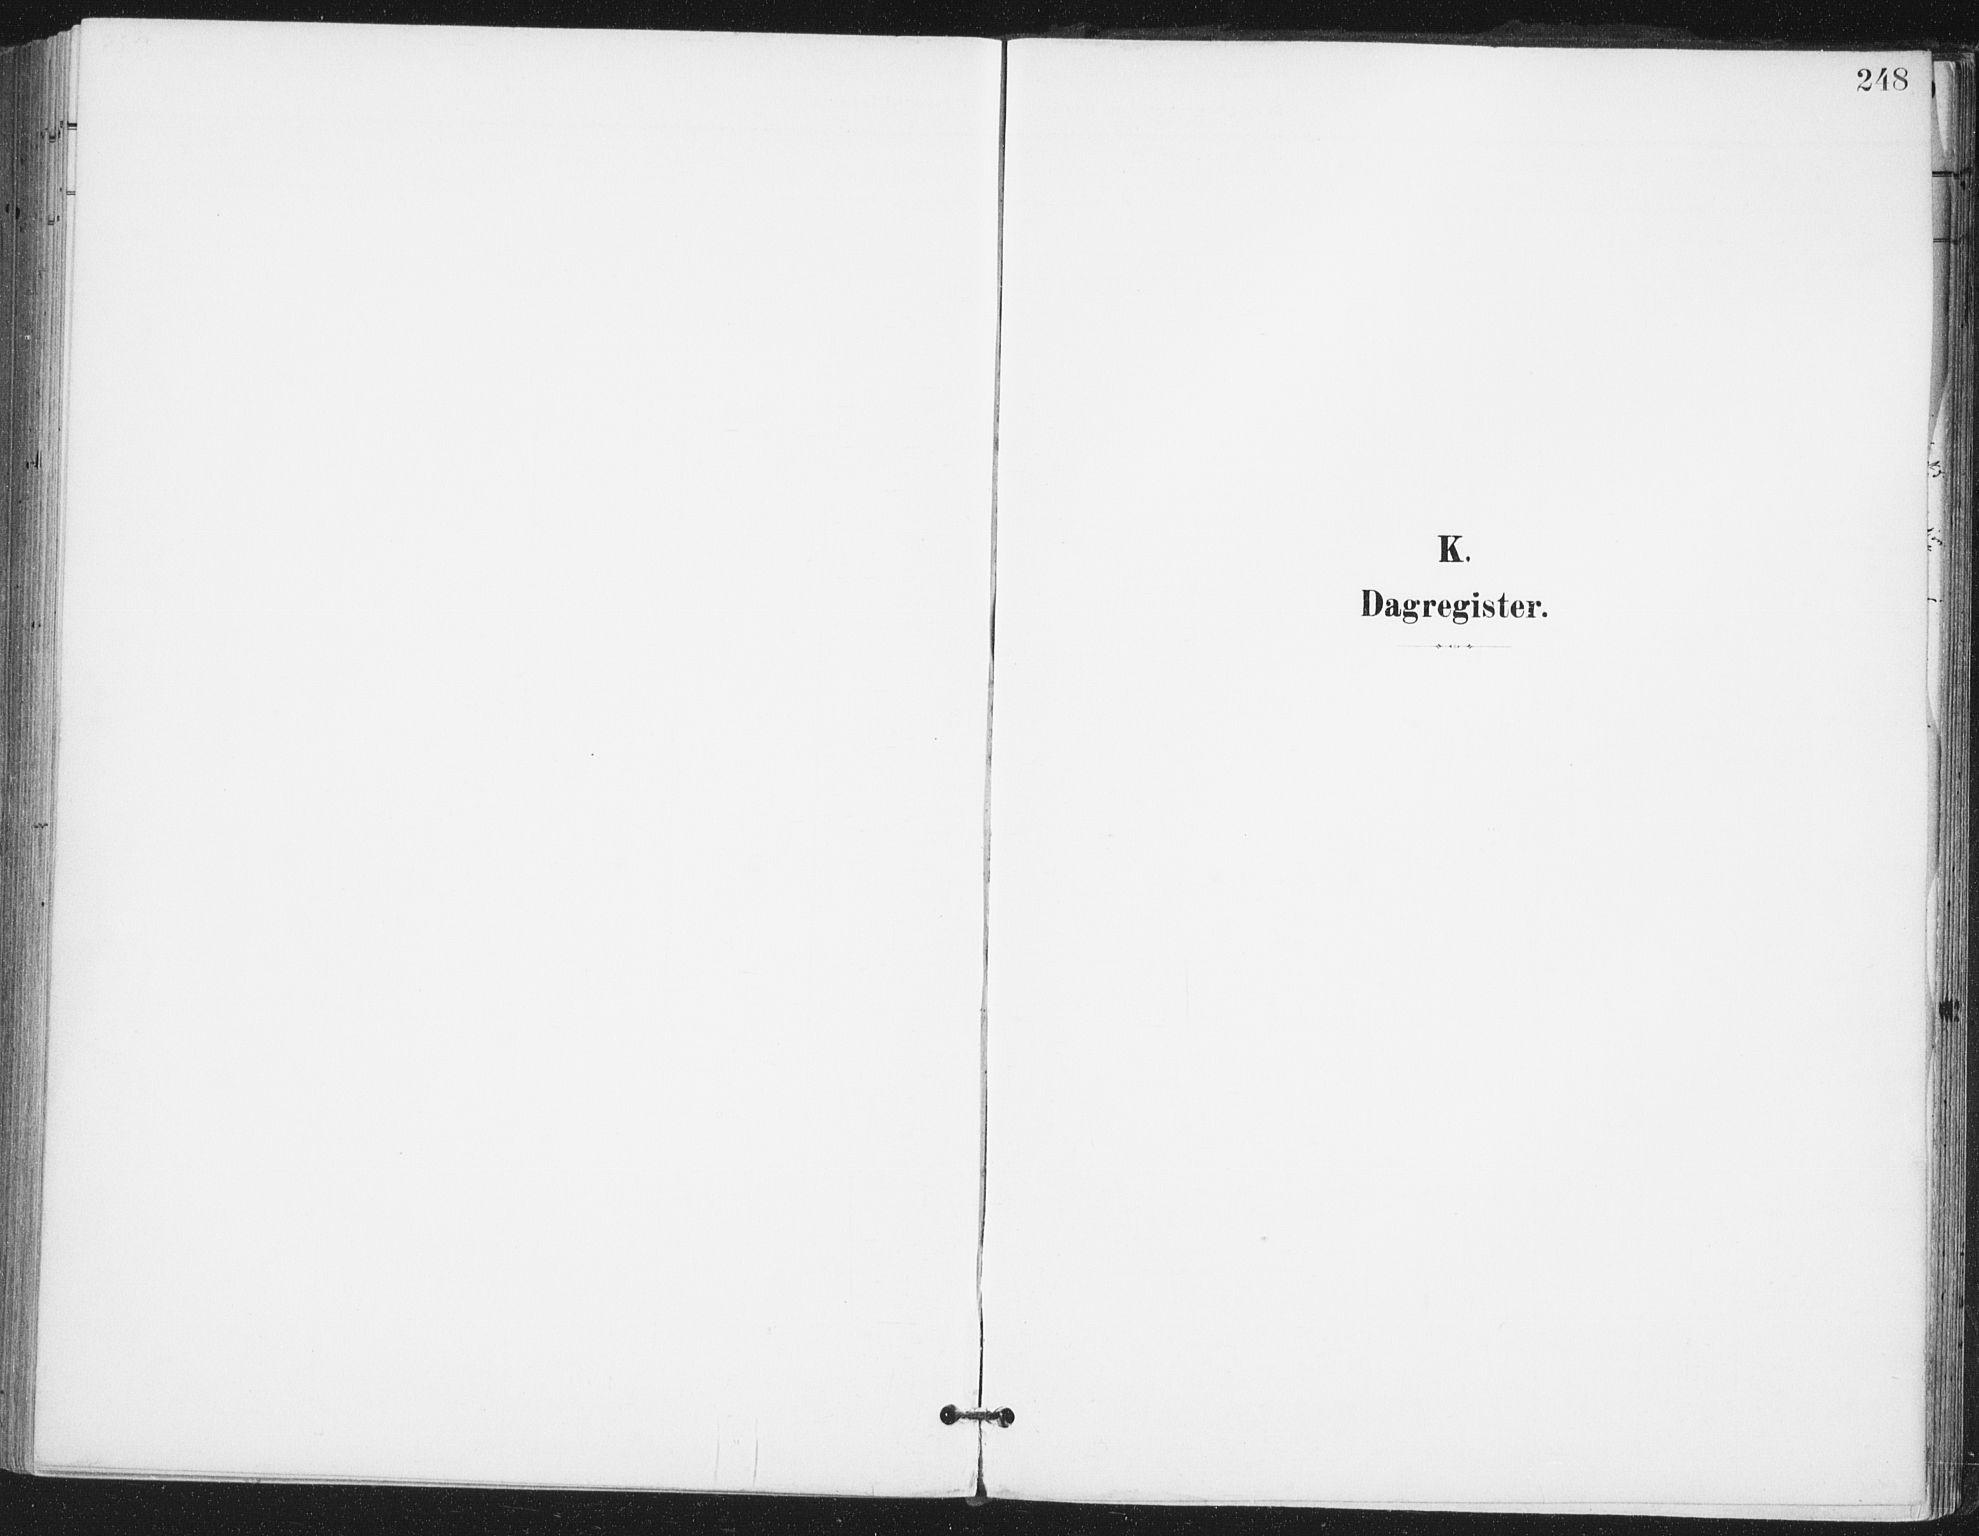 SAO, Ås prestekontor Kirkebøker, F/Fa/L0010: Parish register (official) no. I 10, 1900-1918, p. 248